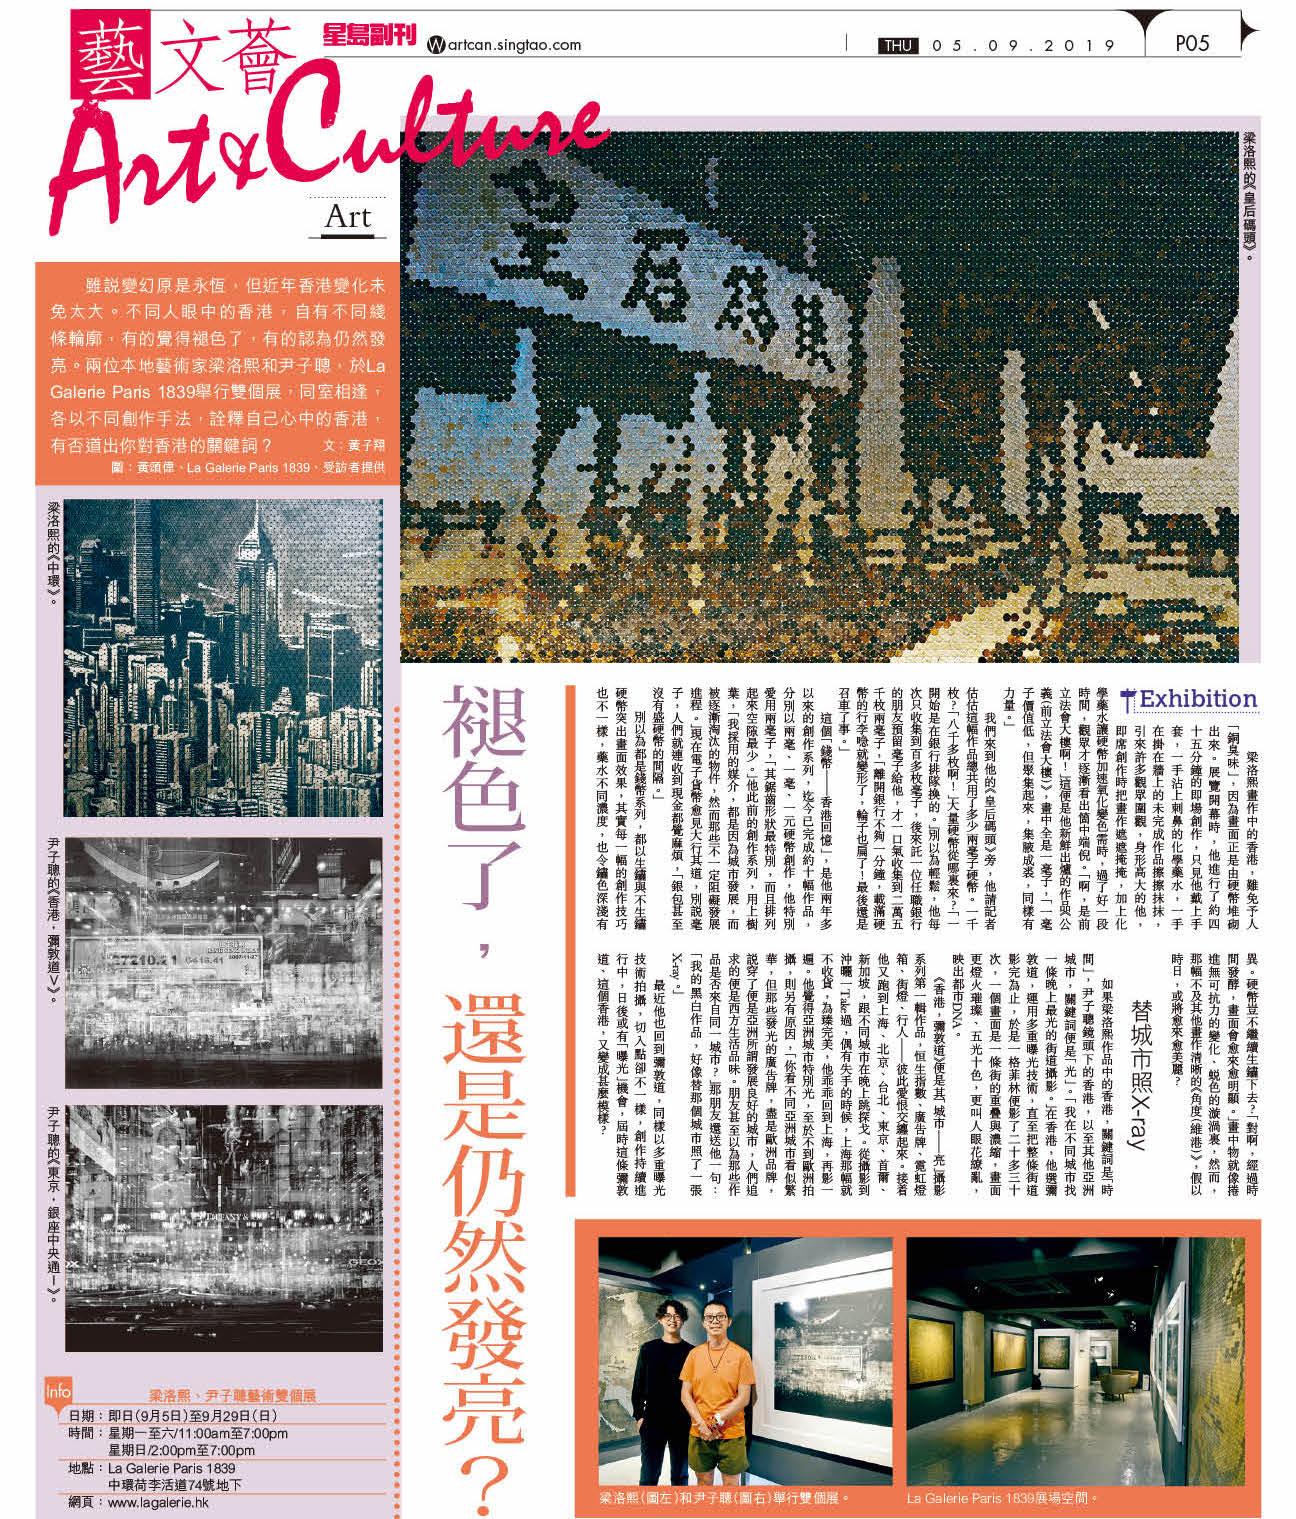 ArtCan-20190905 copy.jpg